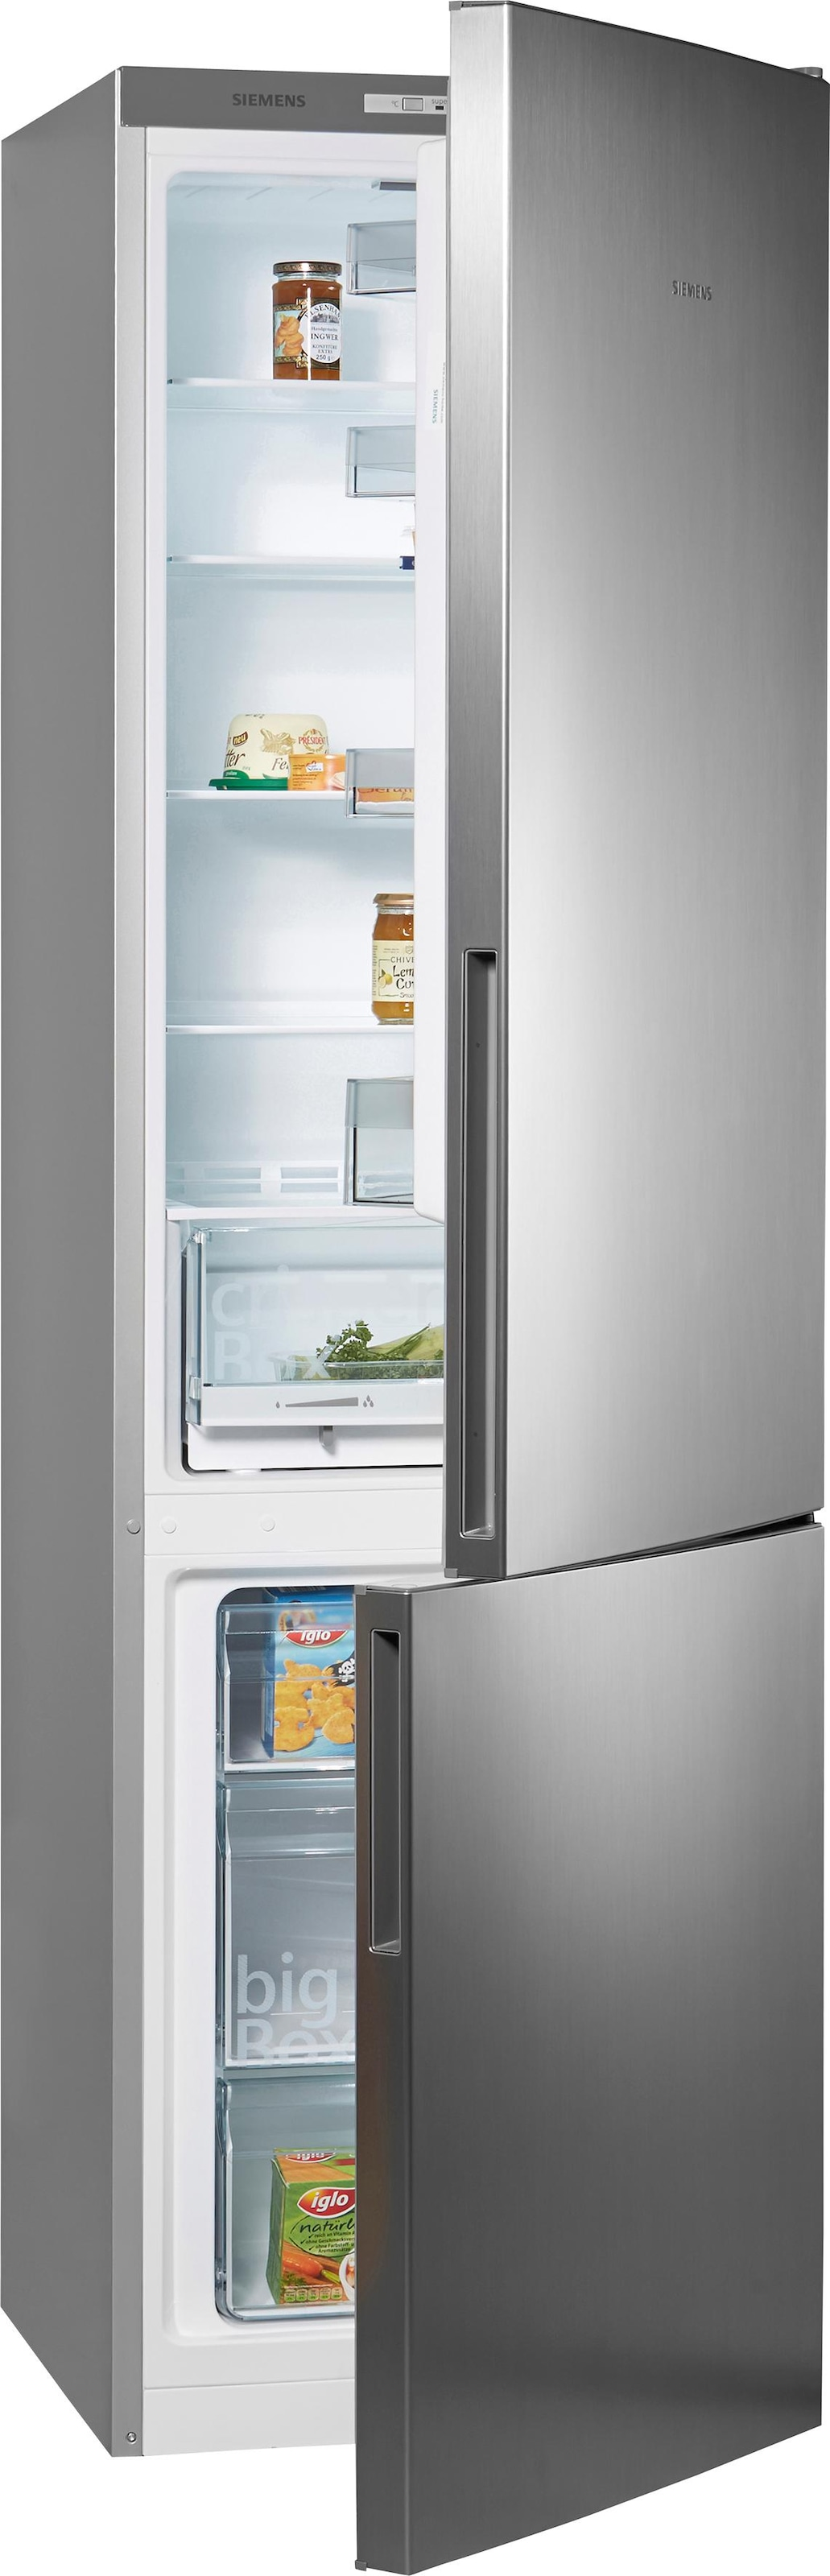 Siemens Kühlschrank : Siemens kühlschrank onlineshop siemens kühlschrank kaufen baur